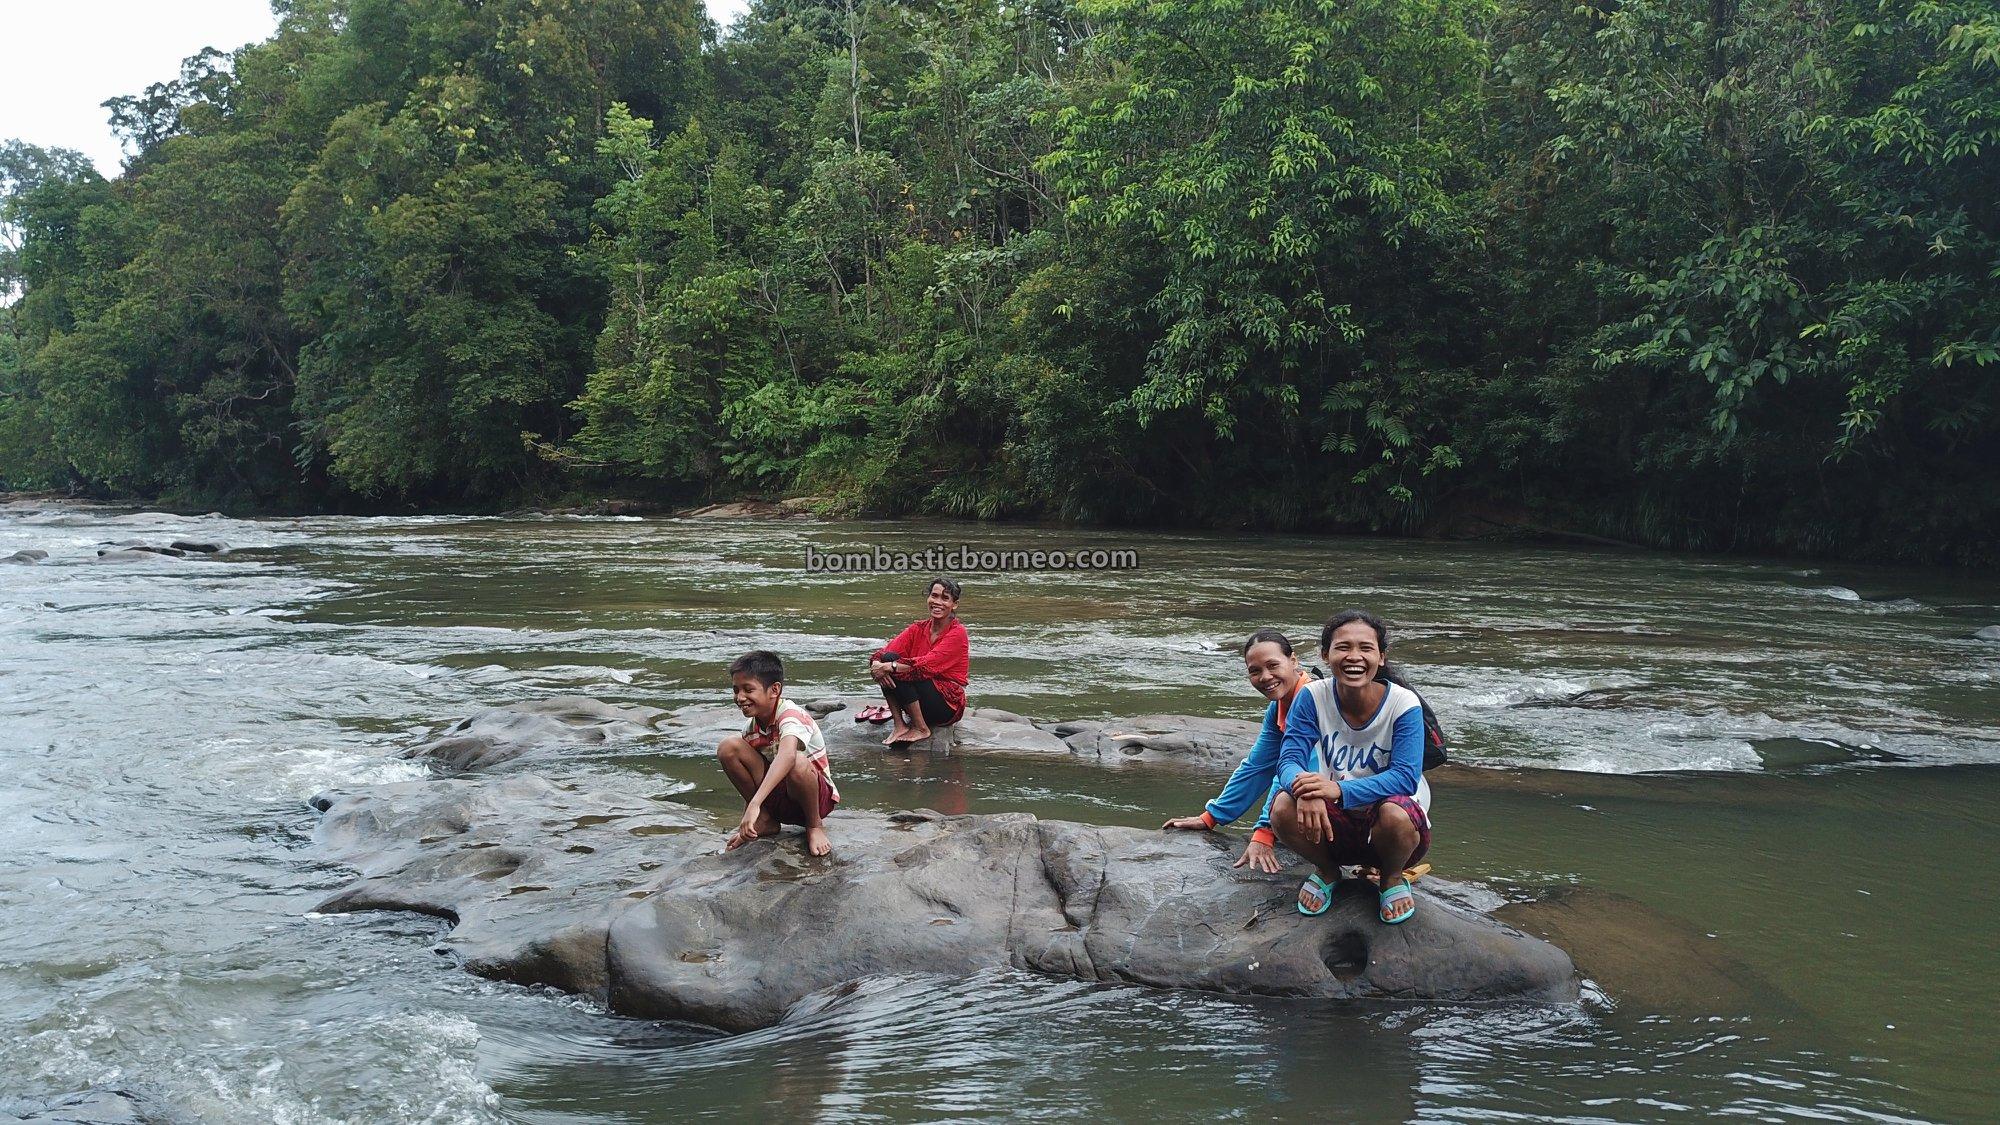 Riam Kodu, Dusun Simpang Empat, adventure, nature, outdoor, jungle trekking, Desa Bengkawan, Seluas, tourist attraction, travel guide, native, Cross Border, backpackers, 探索婆罗洲游踪, 西加里曼丹瀑布,